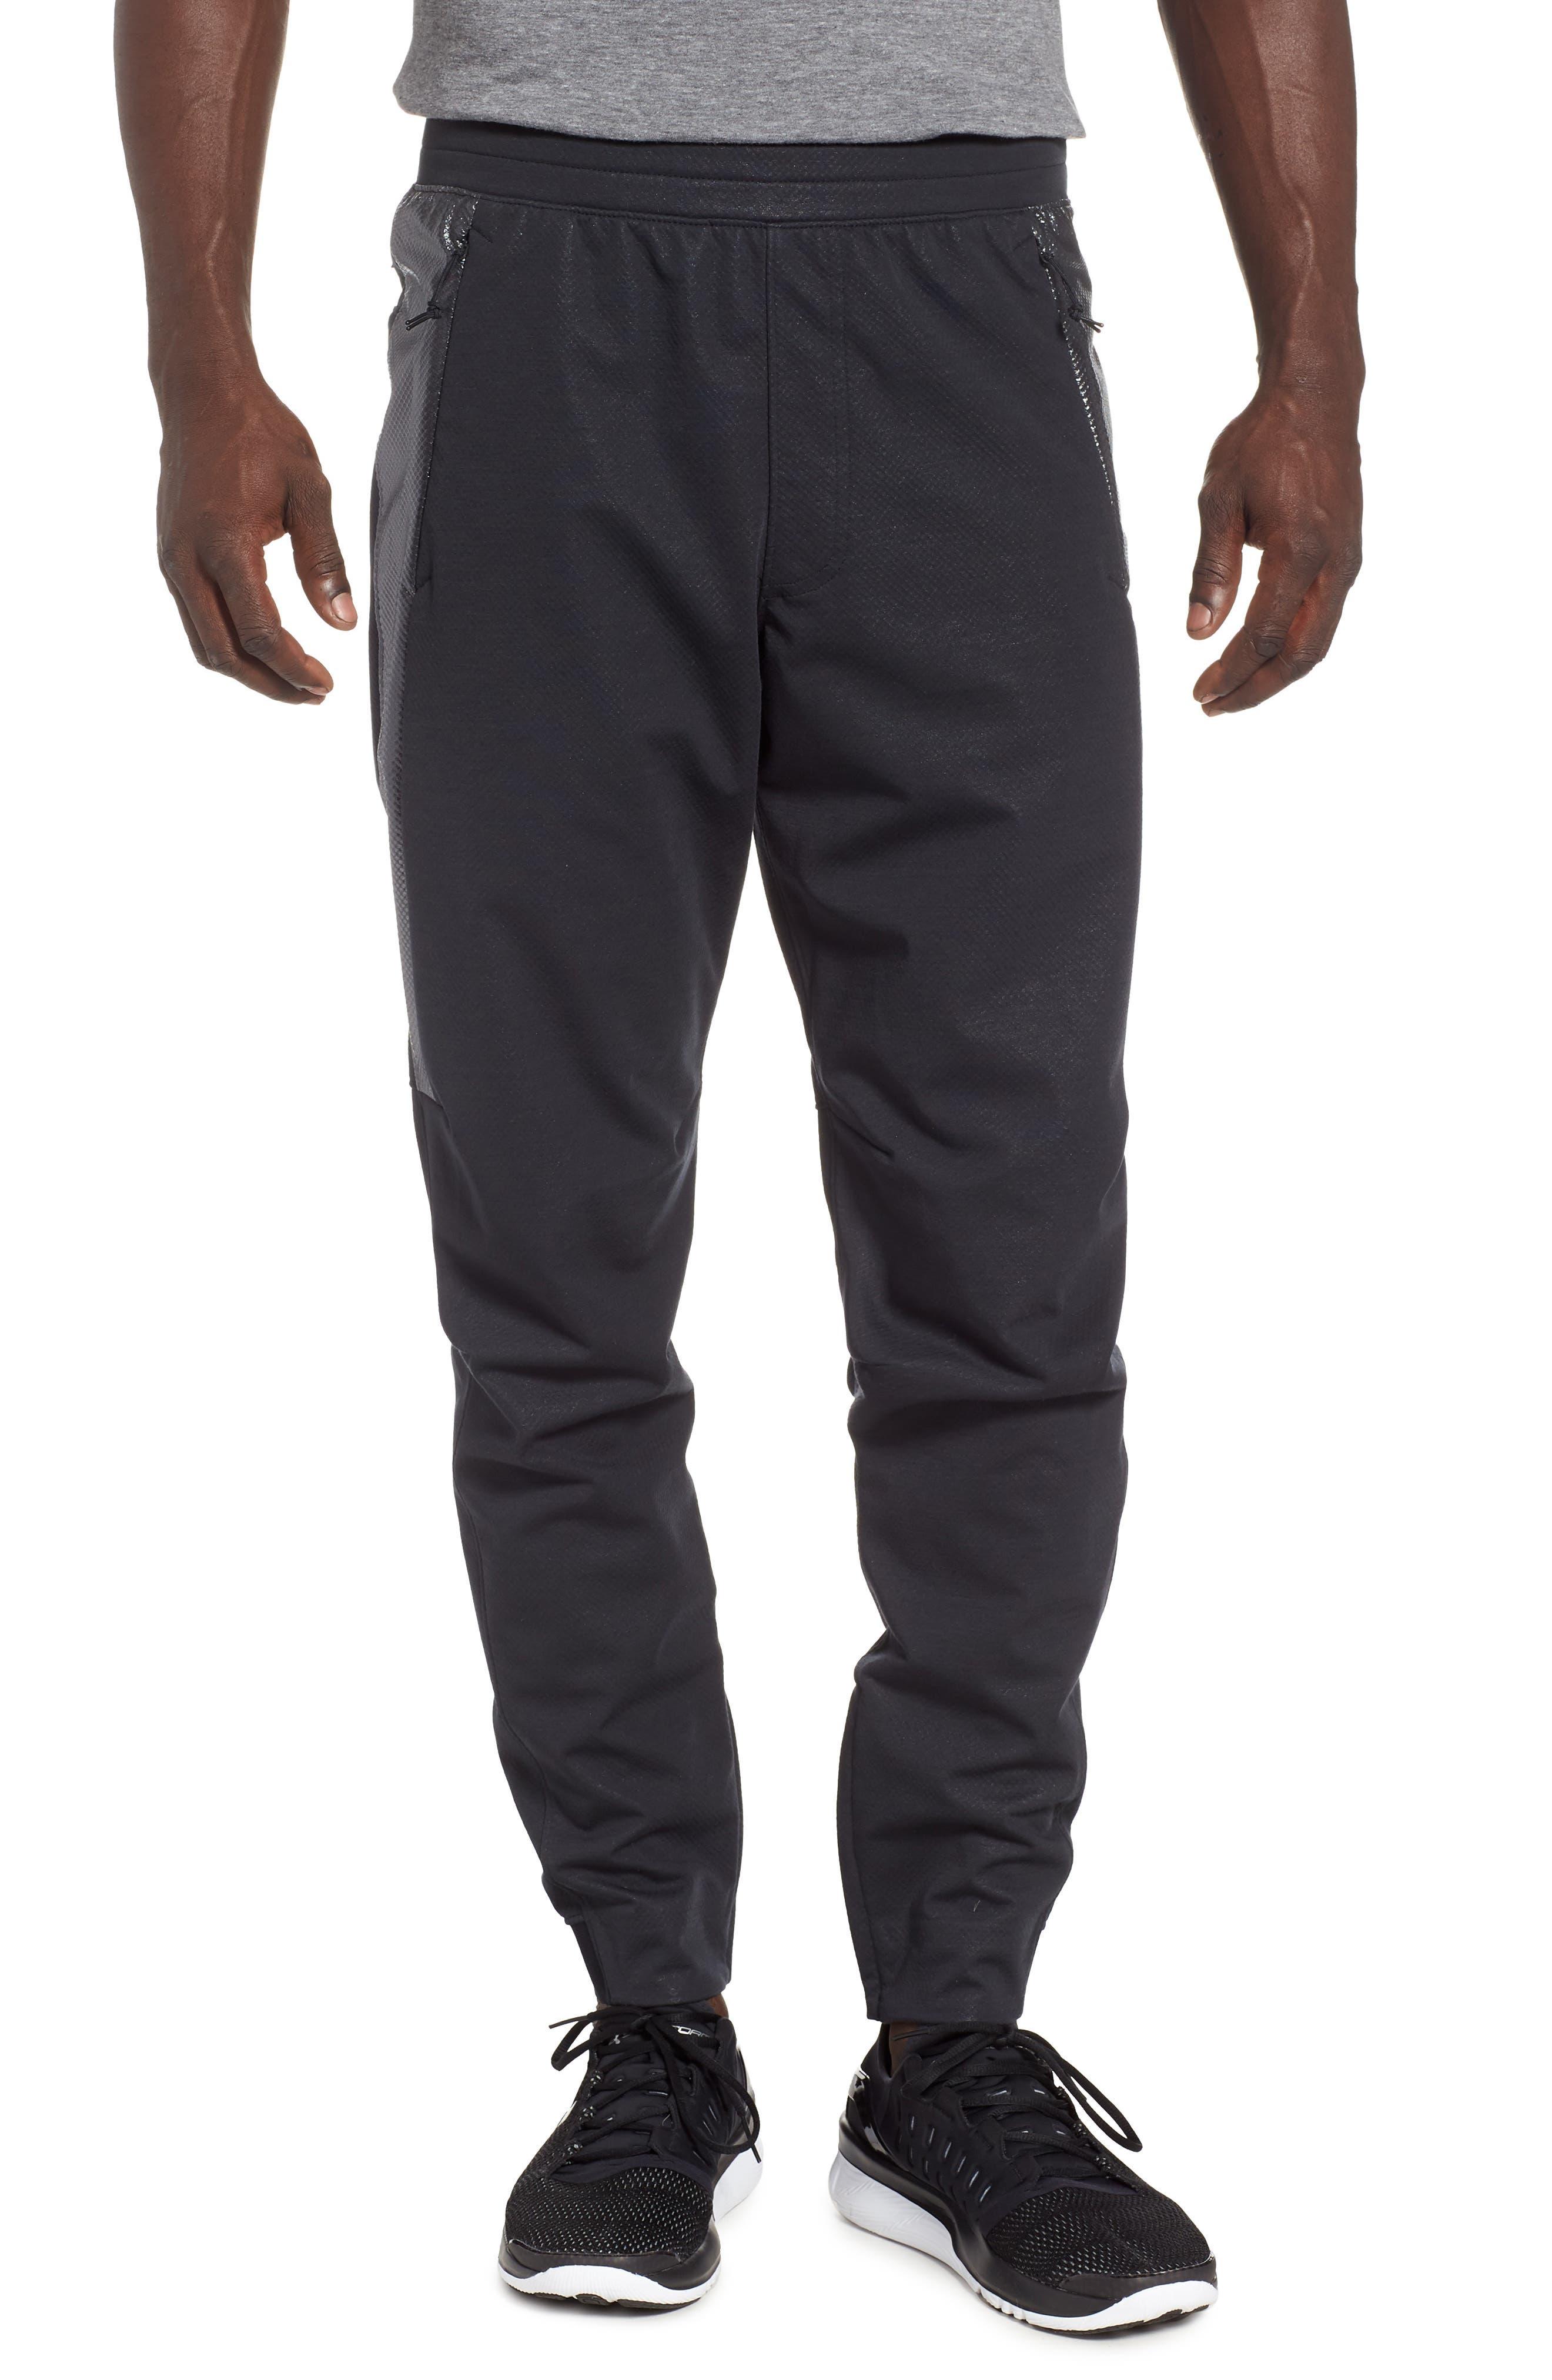 Unstoppable Swacket Training Pants,                             Main thumbnail 1, color,                             BLACK FULL HEATHER/ BLACK